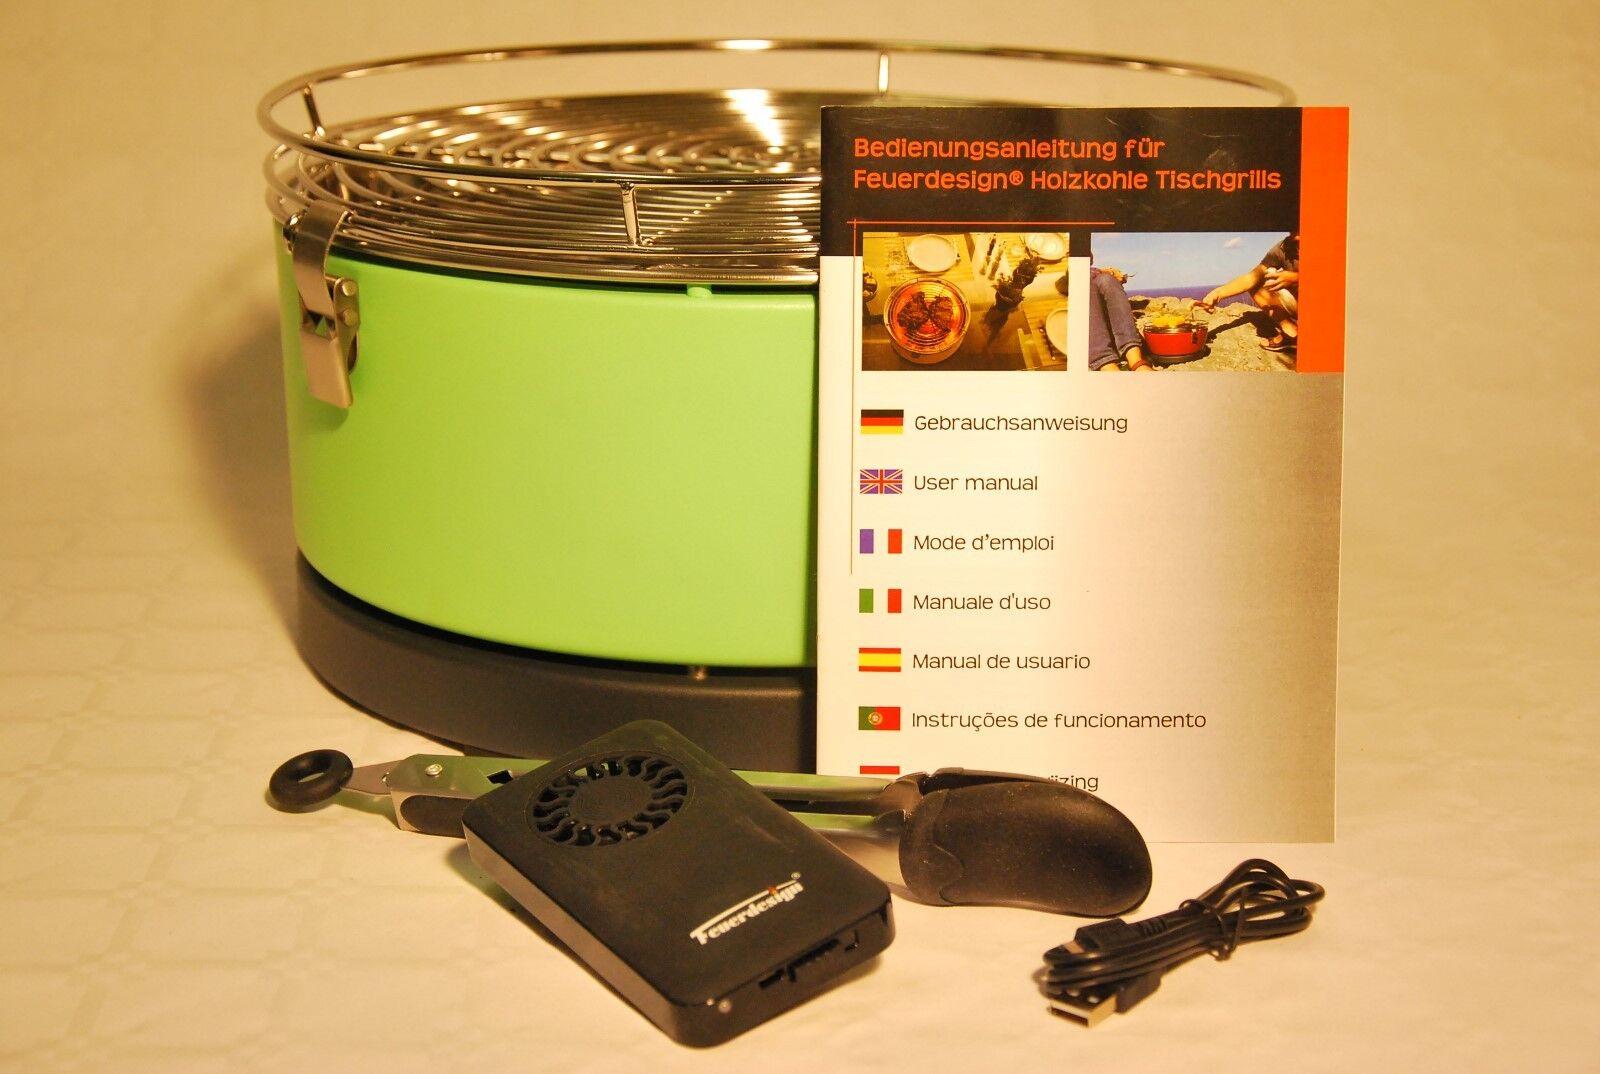 Grill Tischgrill Holzkohle Lüftergrill Mayon grün Feuerdesign